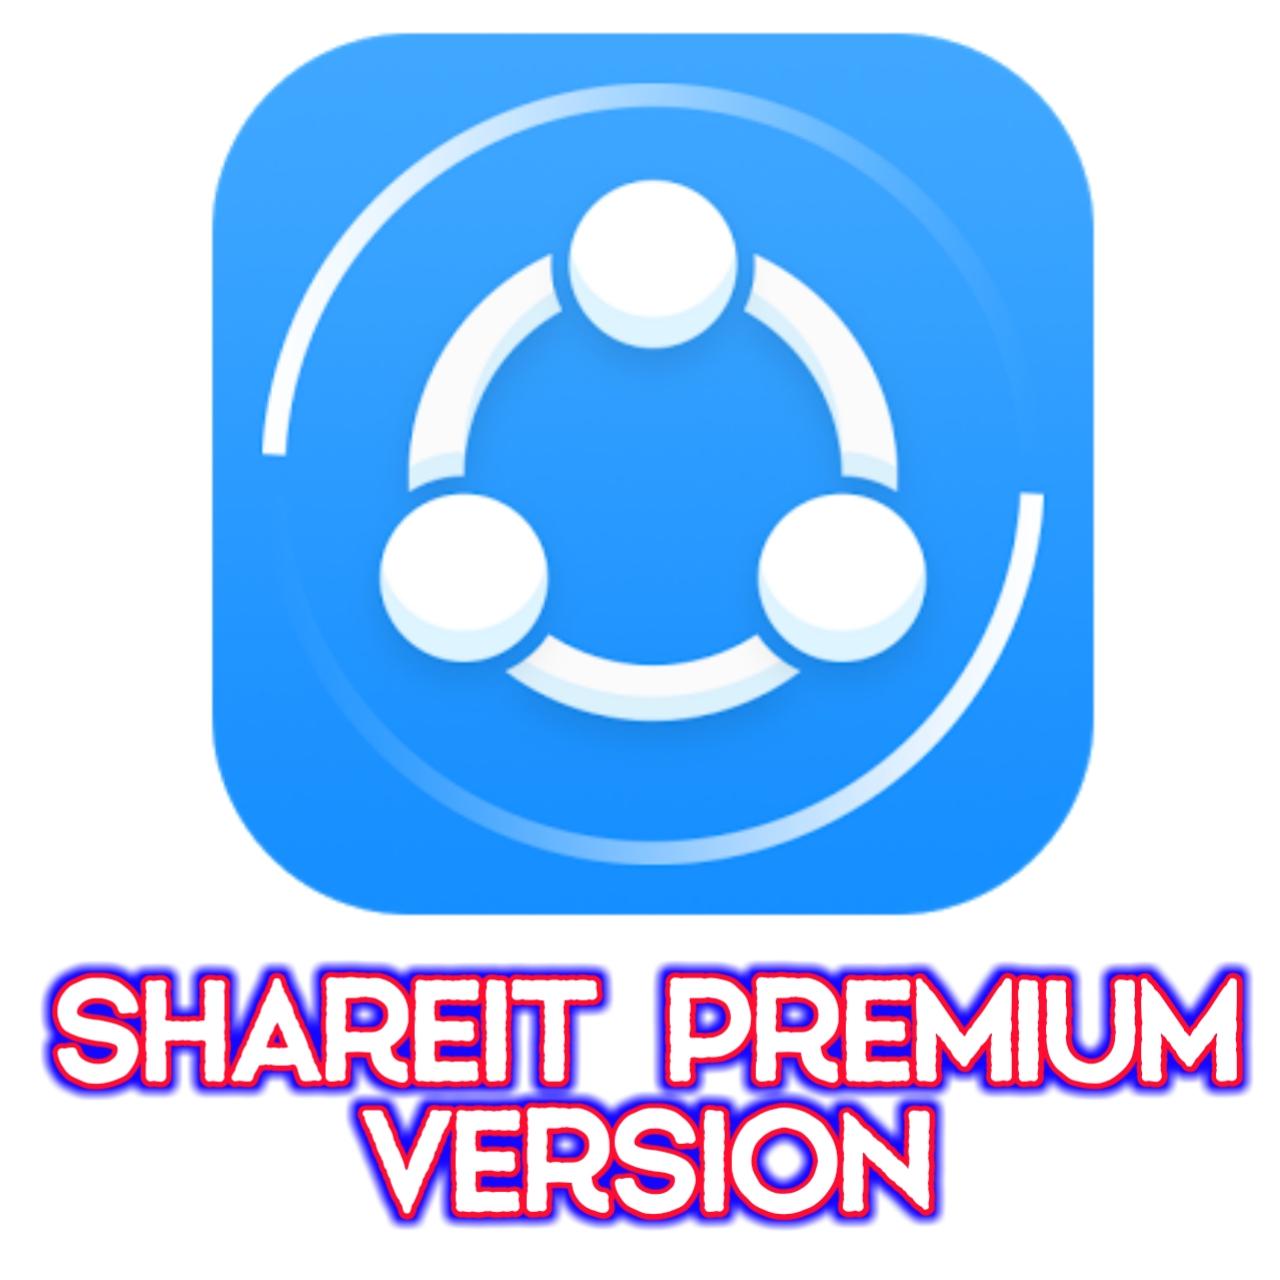 DOWNLOAD করুন SharEit premium version আর মুক্তি পান Ads এর ঝামেলা থেকে।